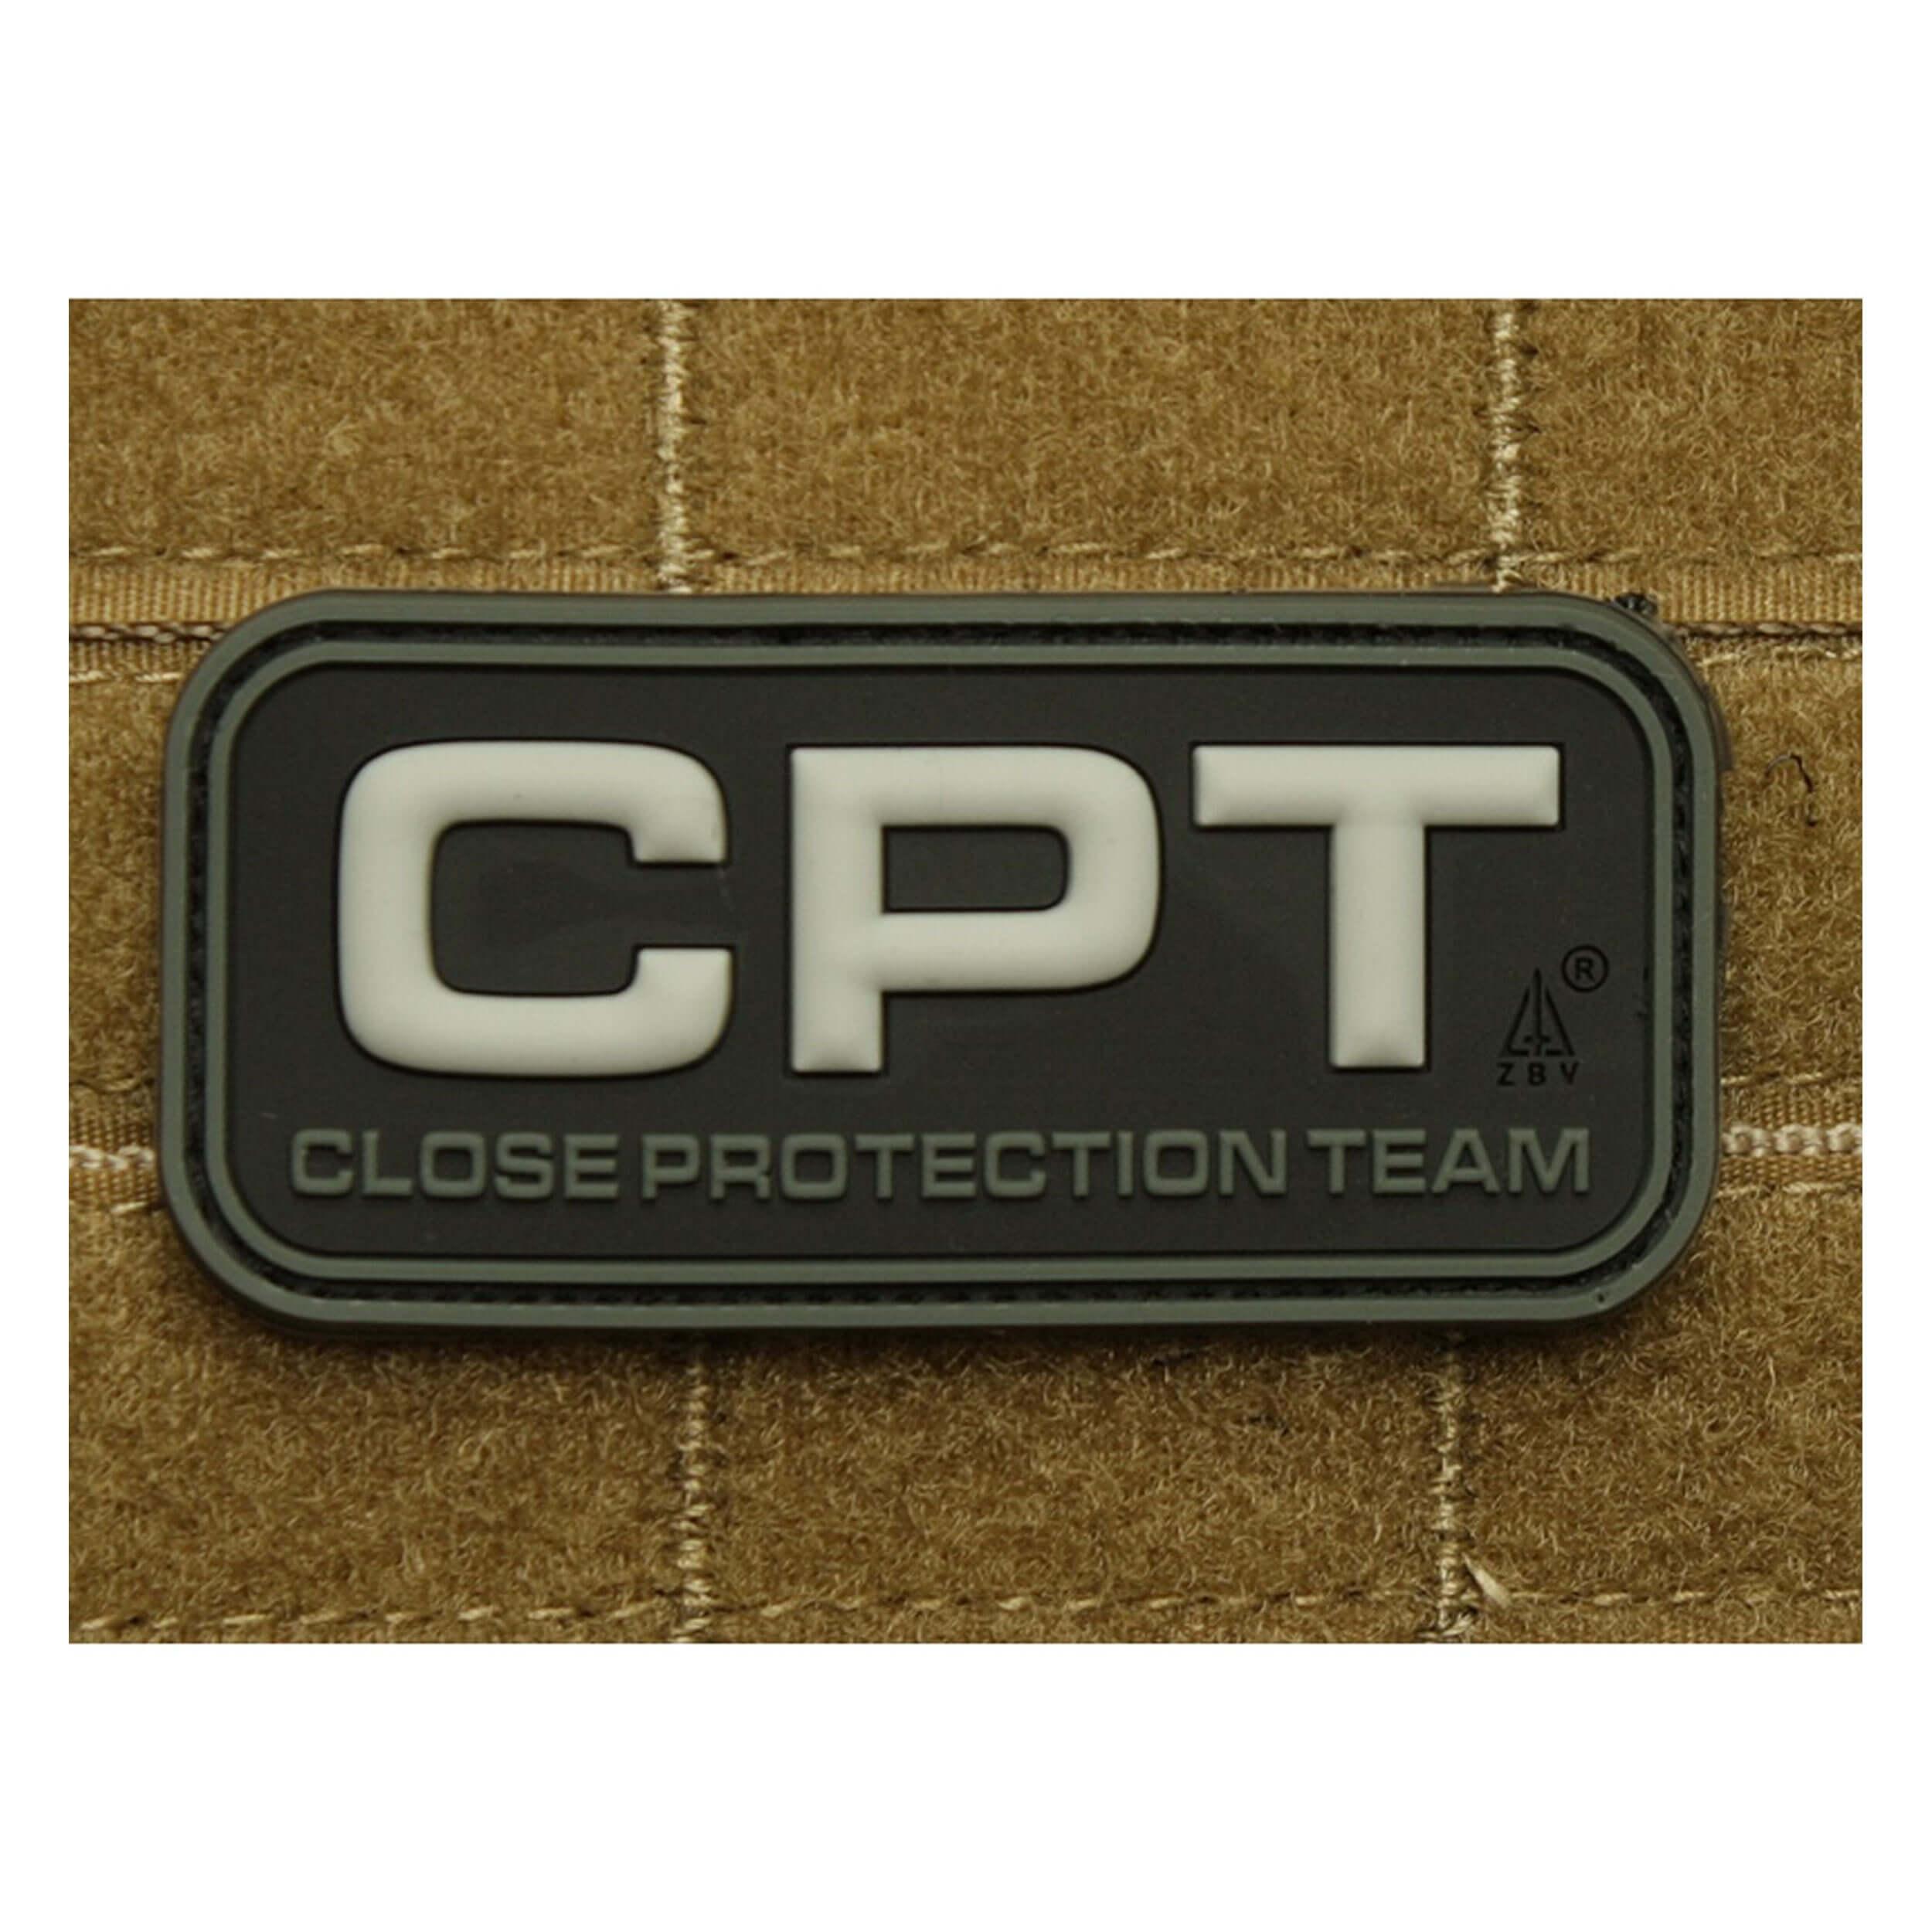 JTG CPT - Close Protection Team / Personenschutz - Patch swat